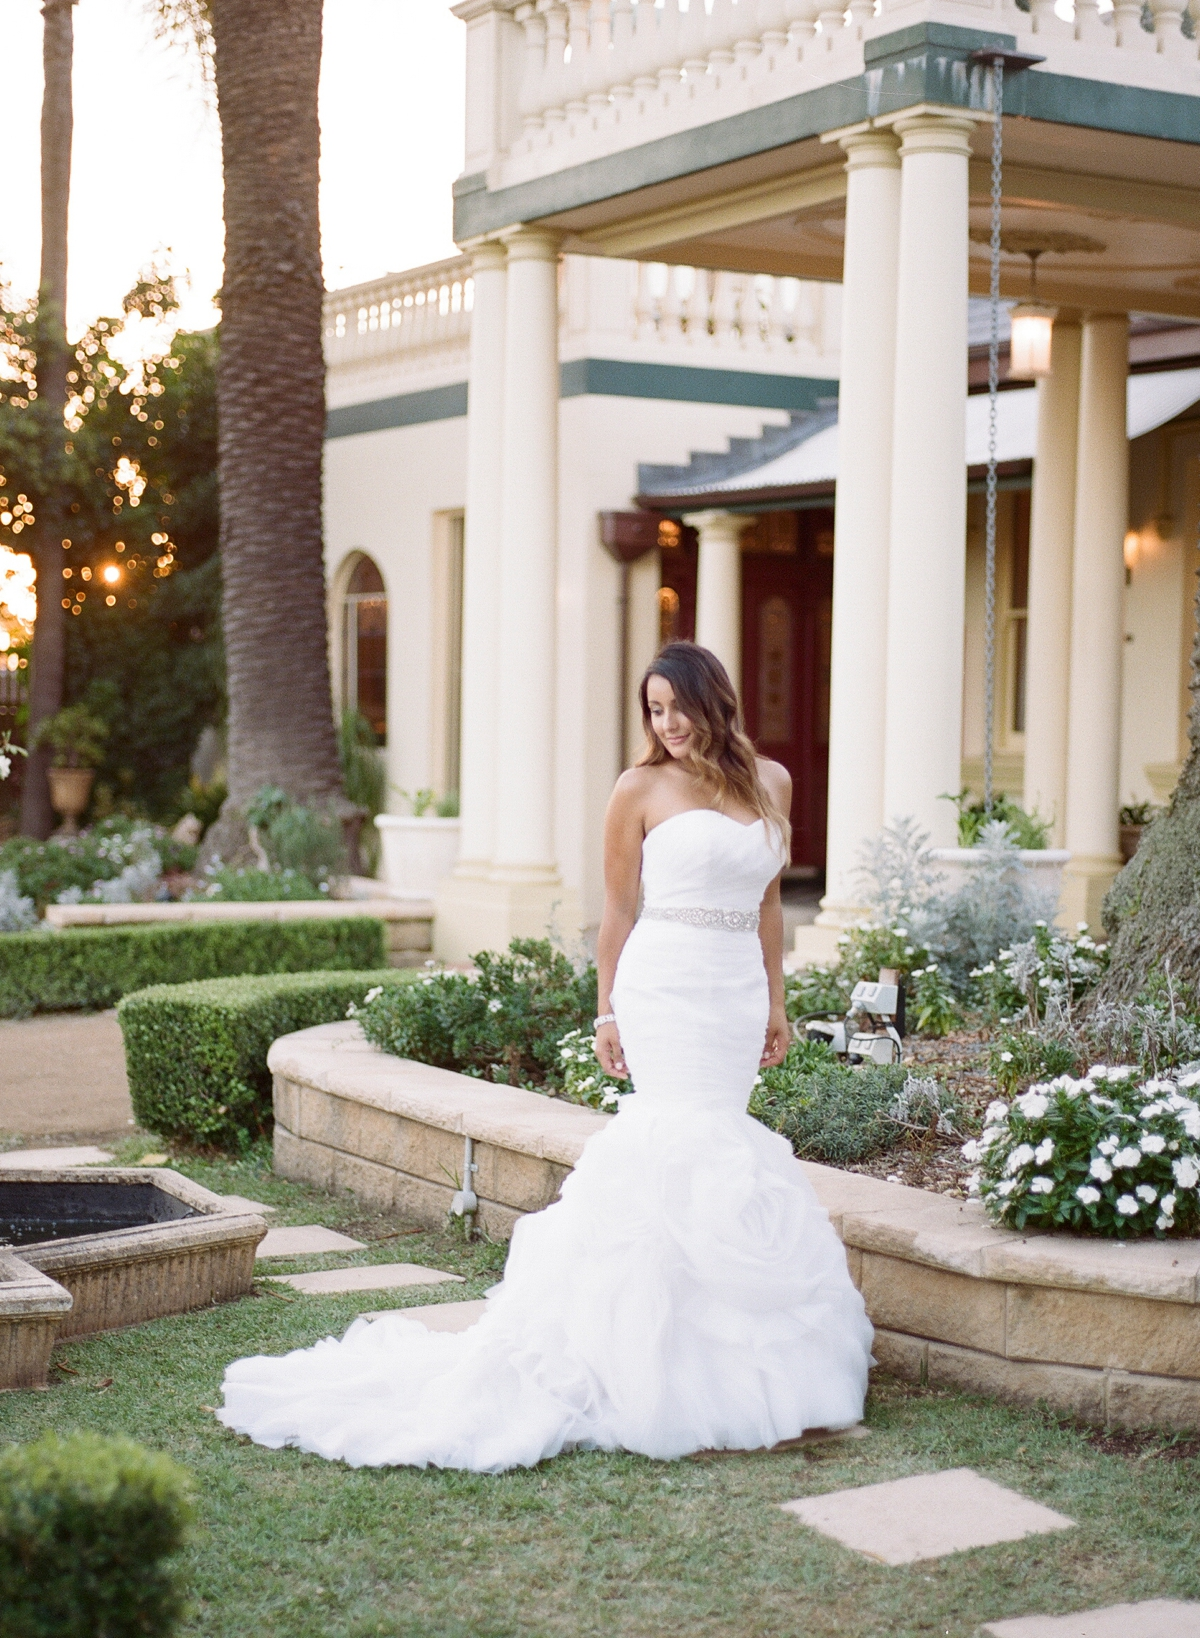 Jaryd and Sarah's Sydney Wedding by Mr Edwards Photography_2336.jpg